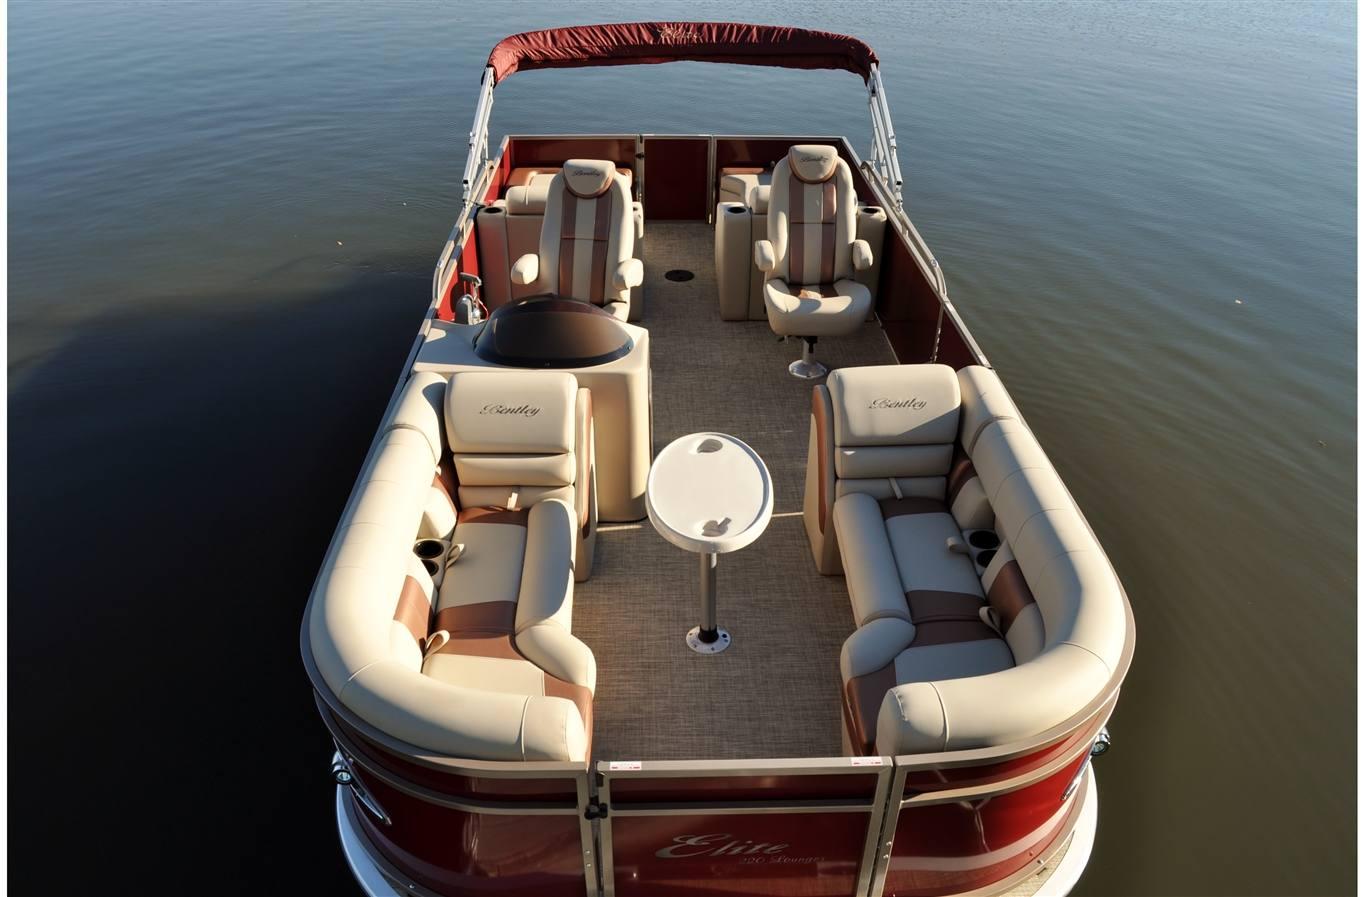 marine special bentley battle show dealer dealers tri image s toon pontoon rivercraft